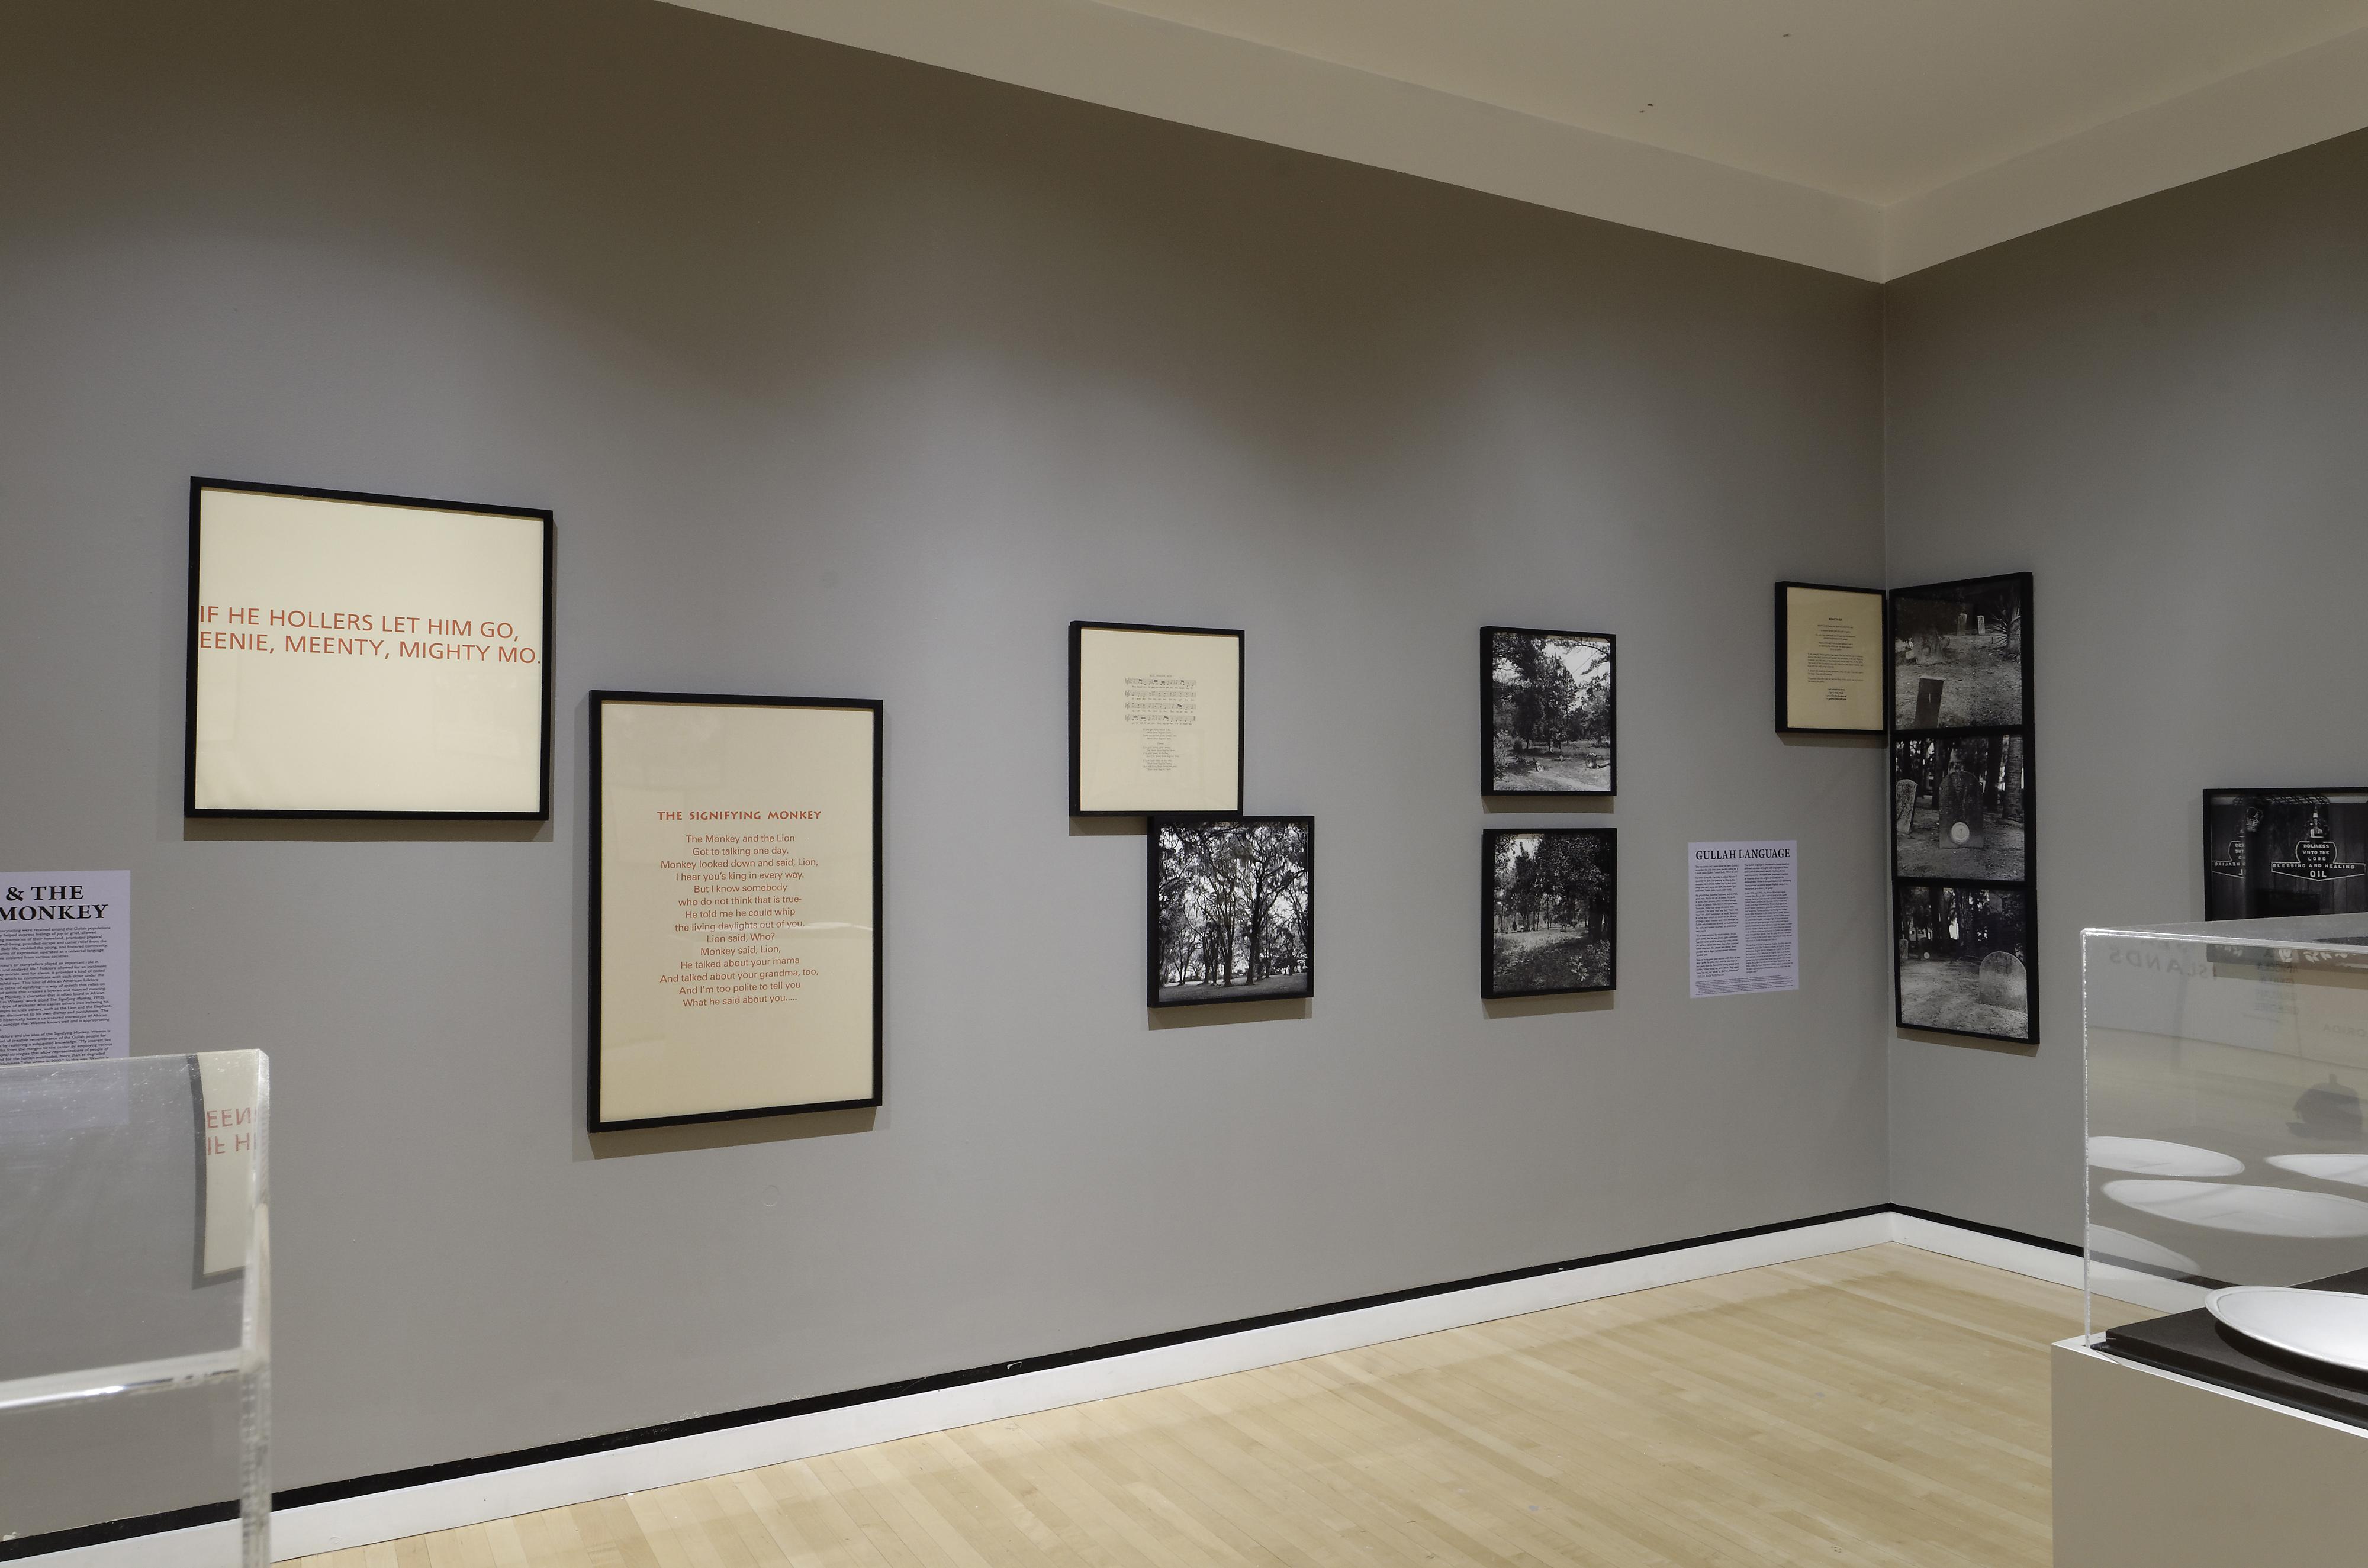 Galerie Barbara Thumm \ Sea Islands Series, 1991 – 1992